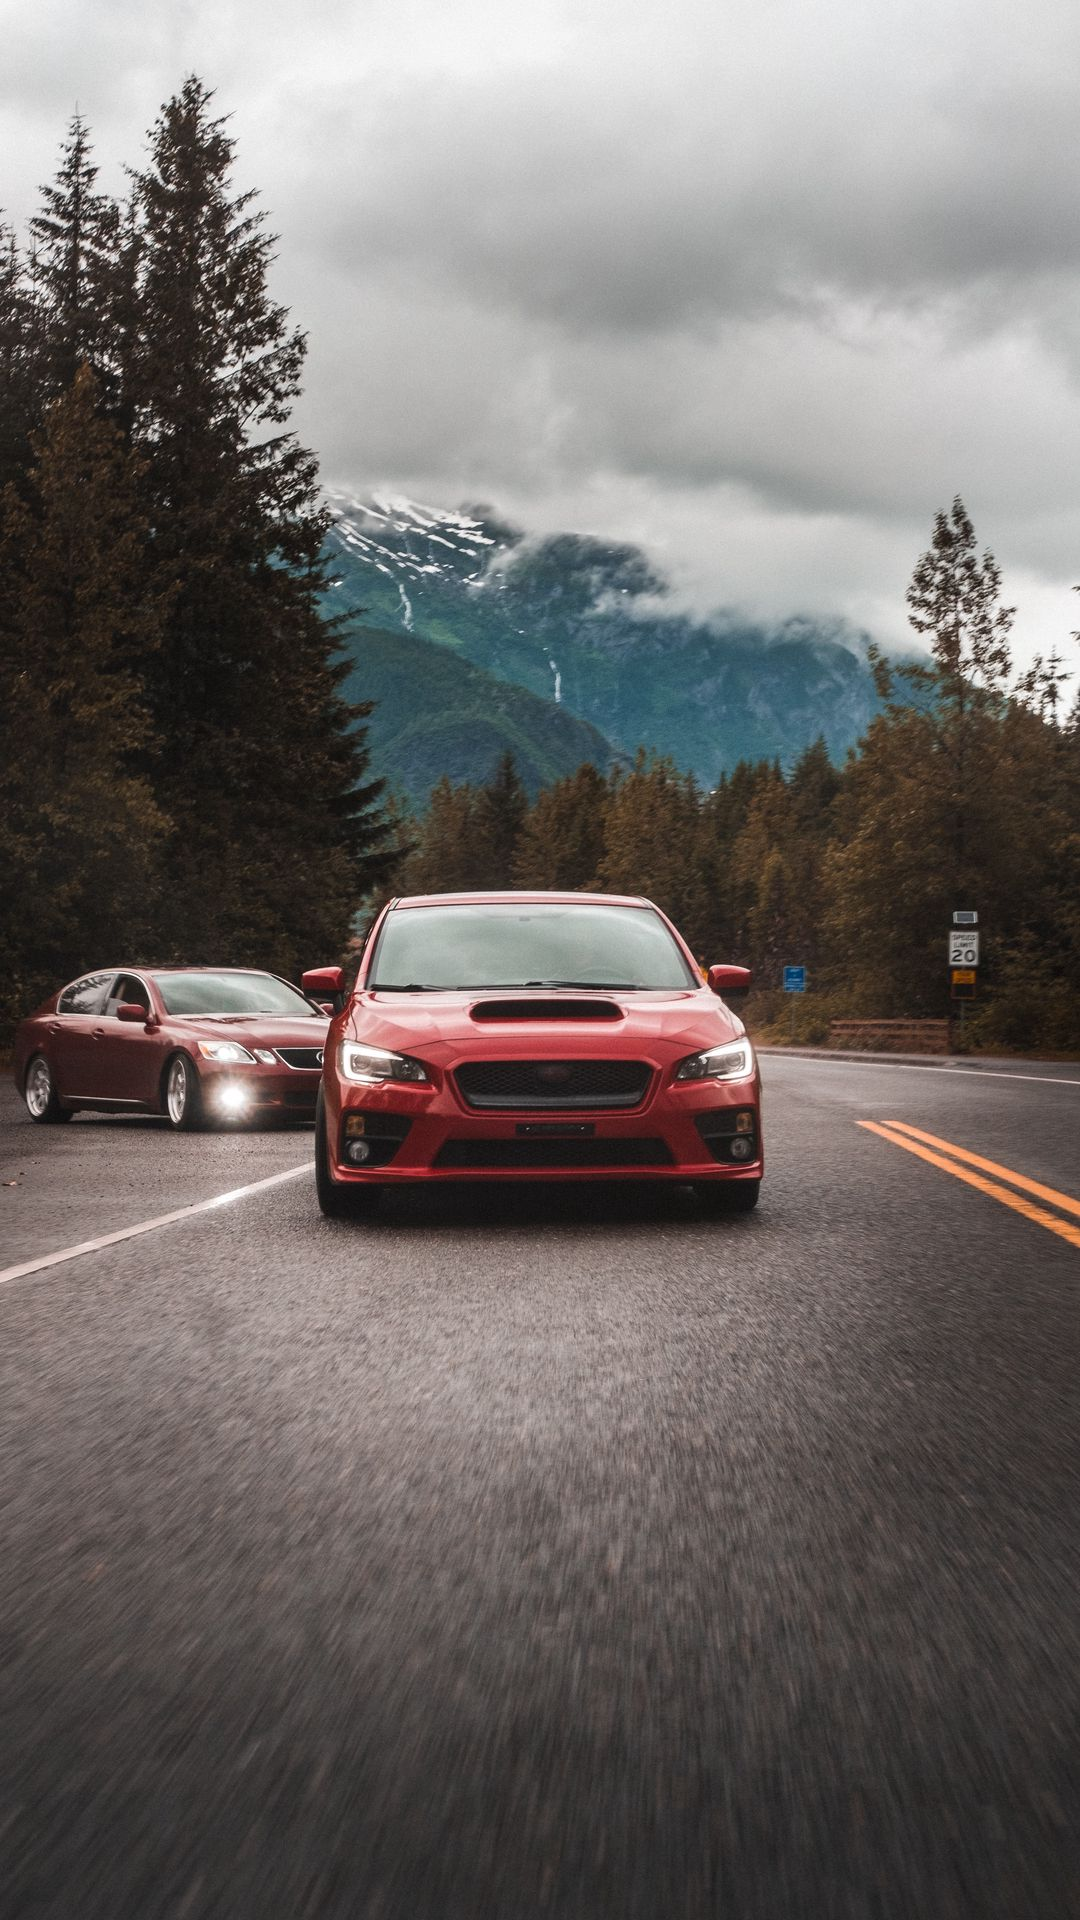 Subaru Background Wallpapers Free Download